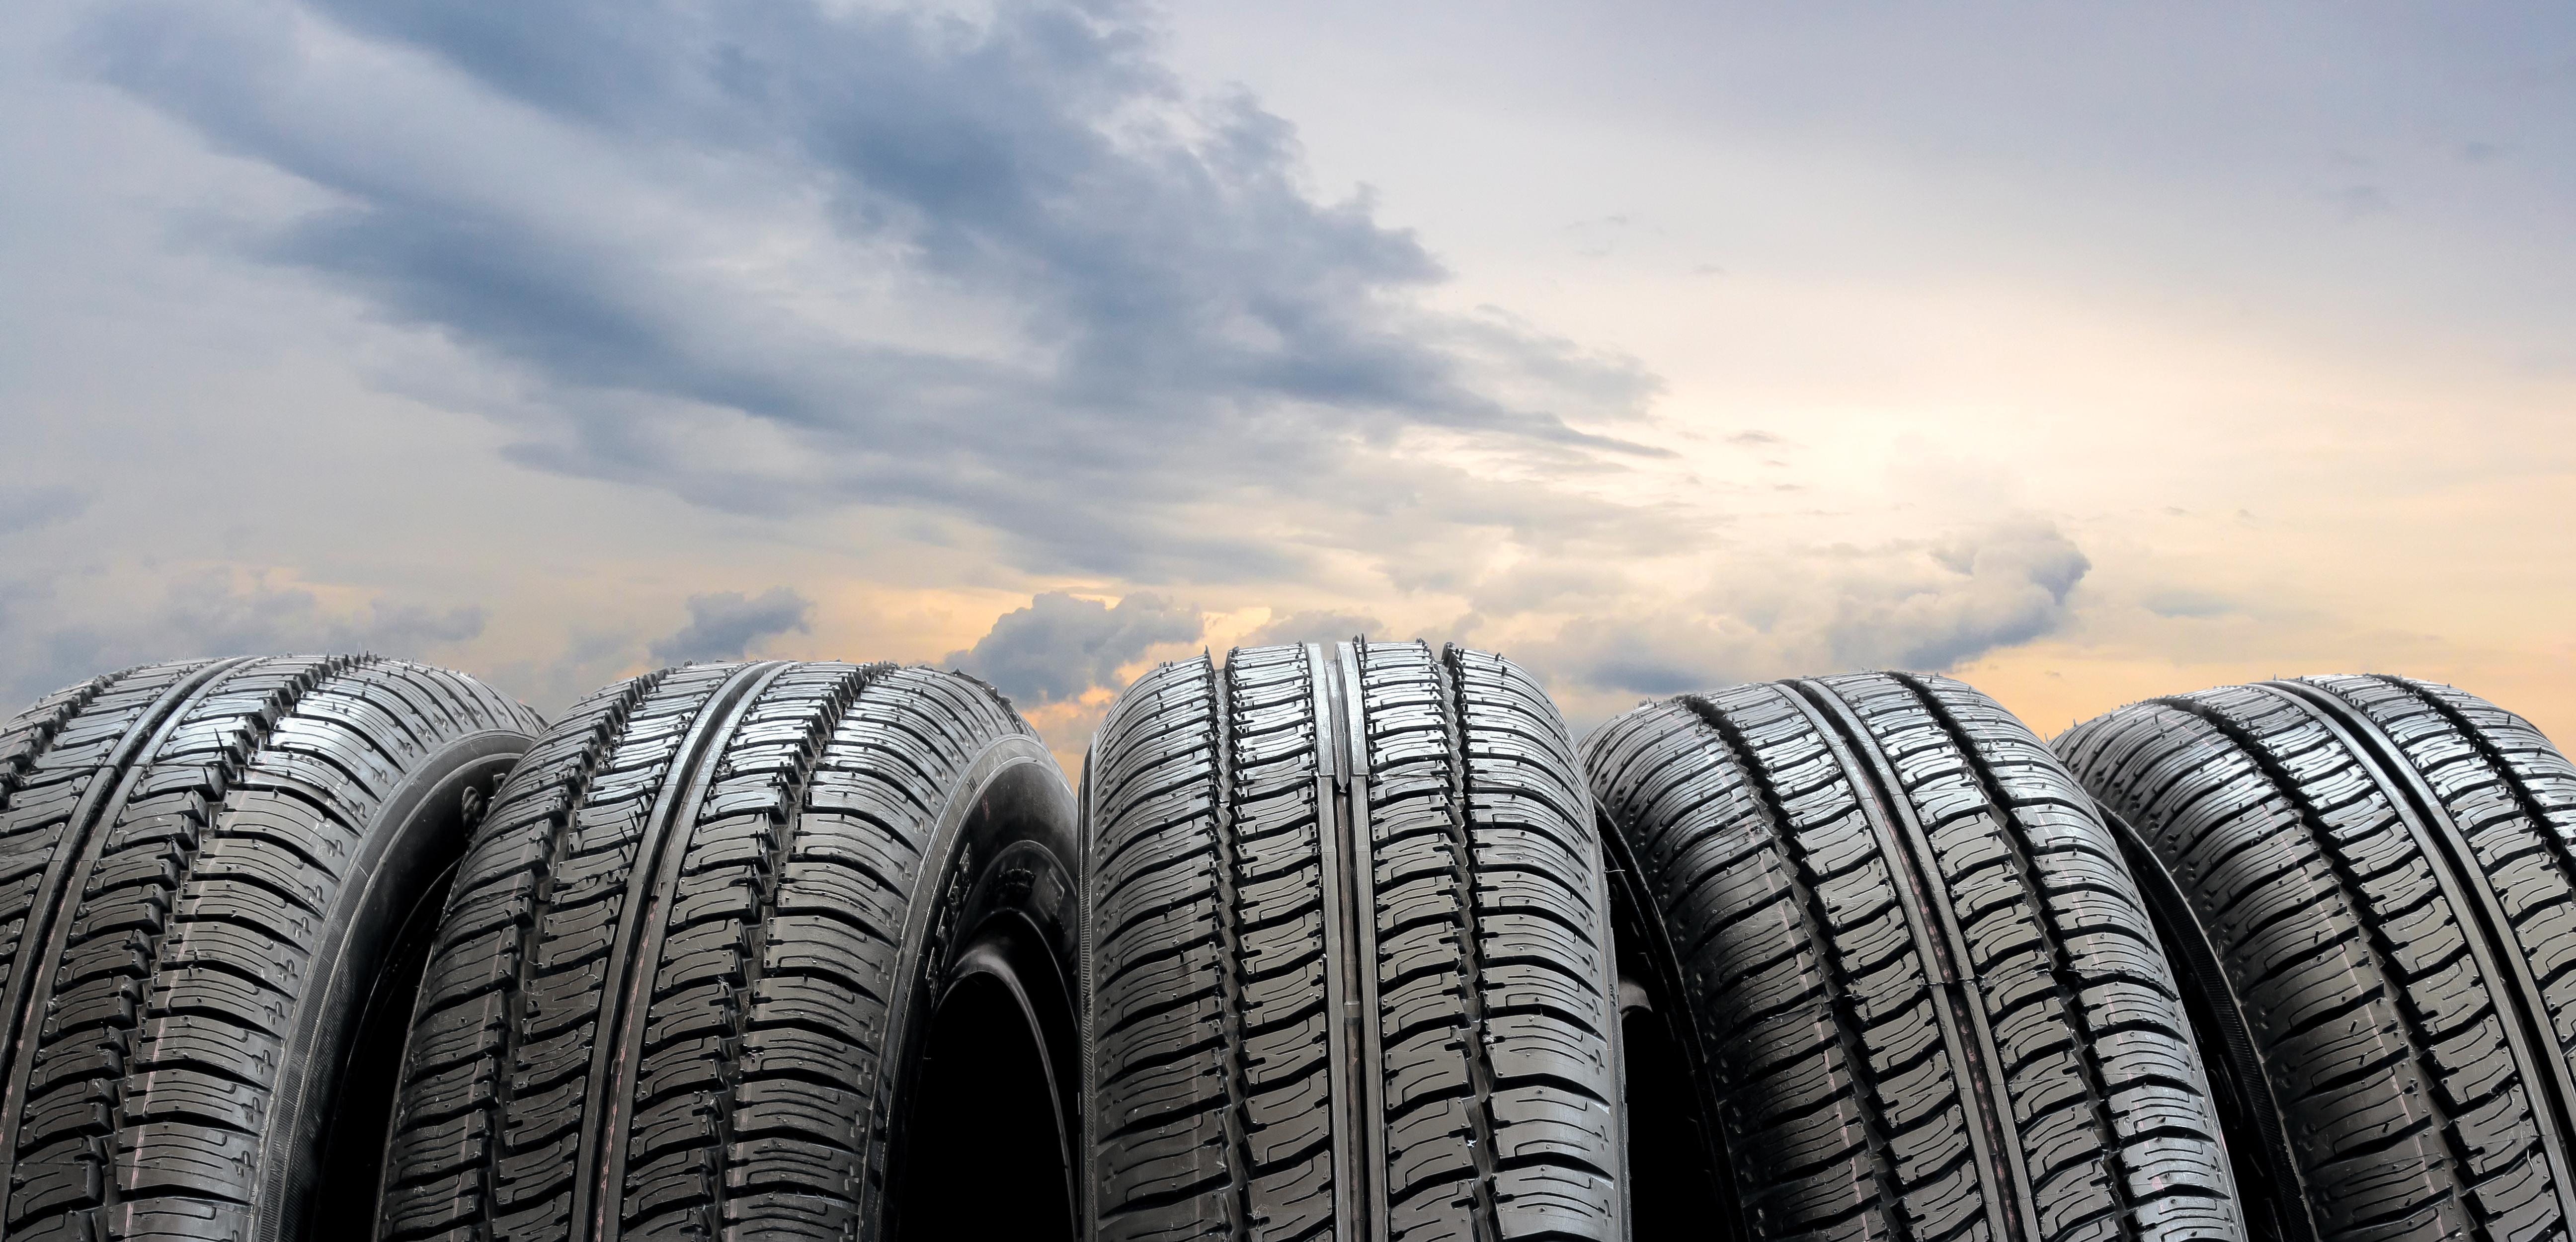 Bridgestone Near Me >> Bridgestone Tires At Alaska Tire Service Alaska Tire Service